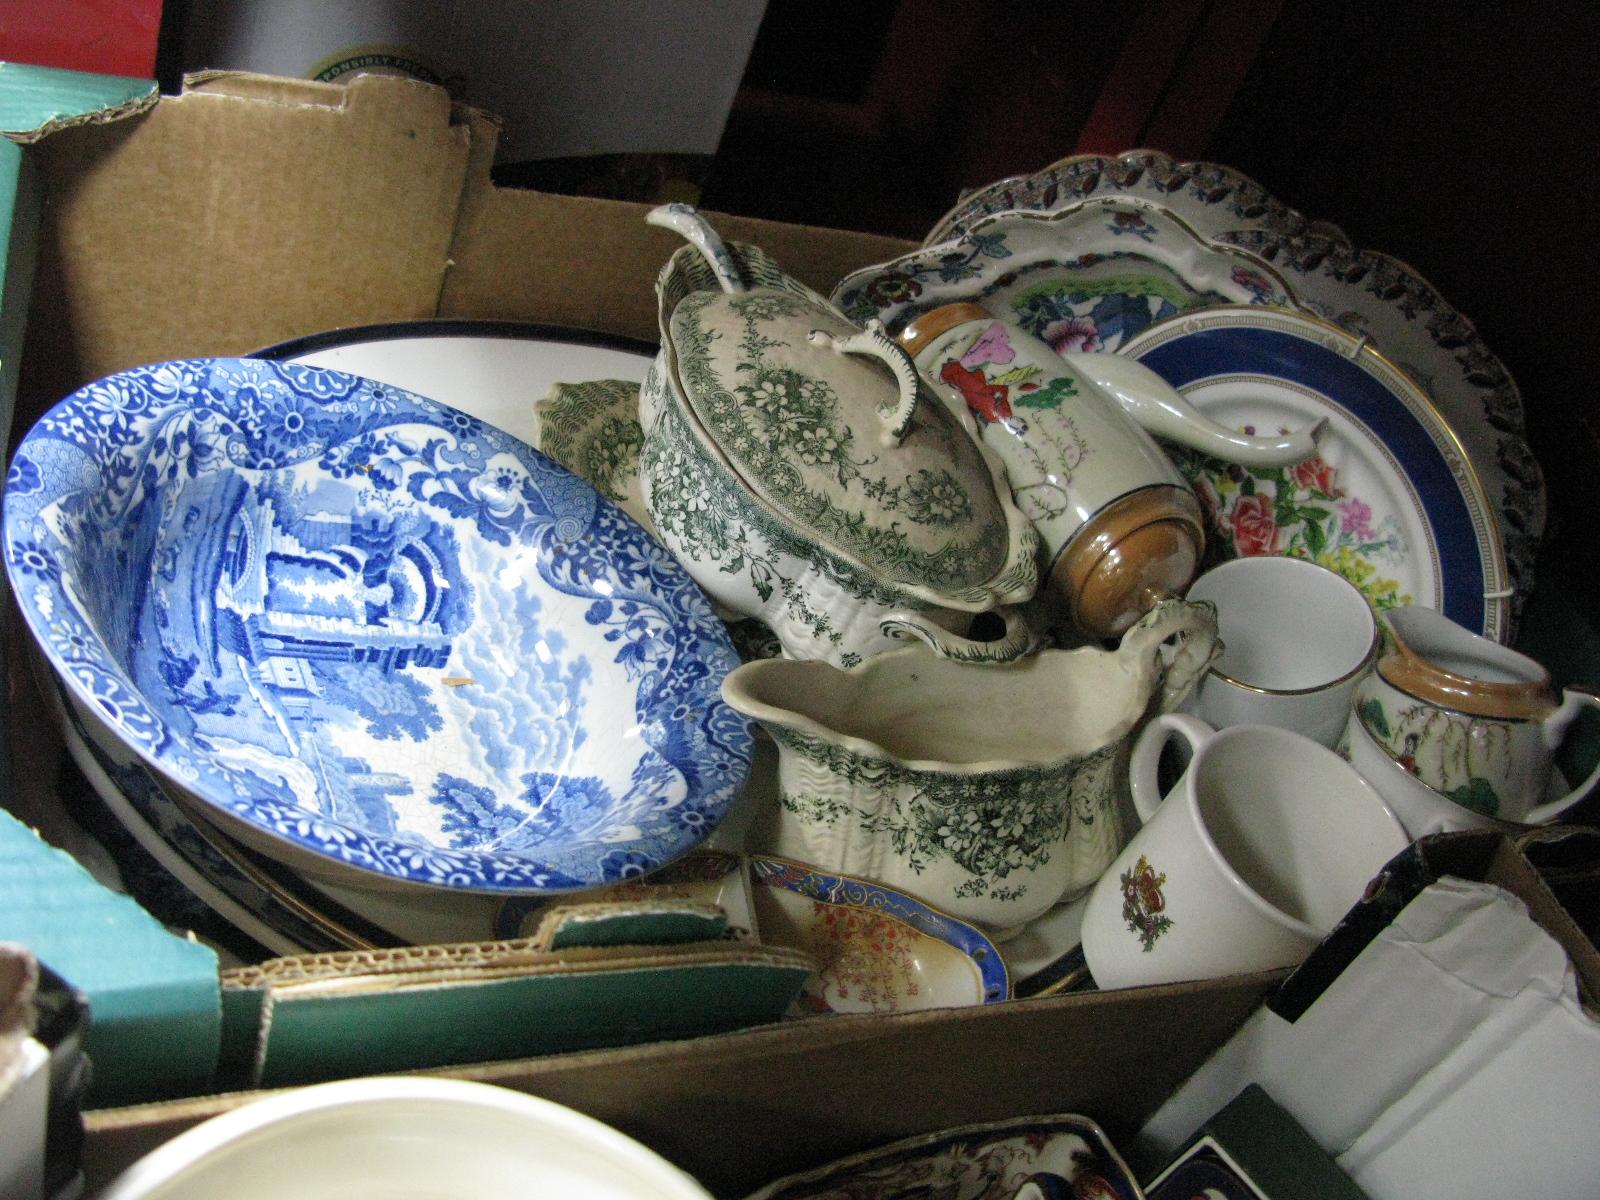 Lot 1029 - Fenton Dinner Plates, tureen, meat plates, etc:- One Box